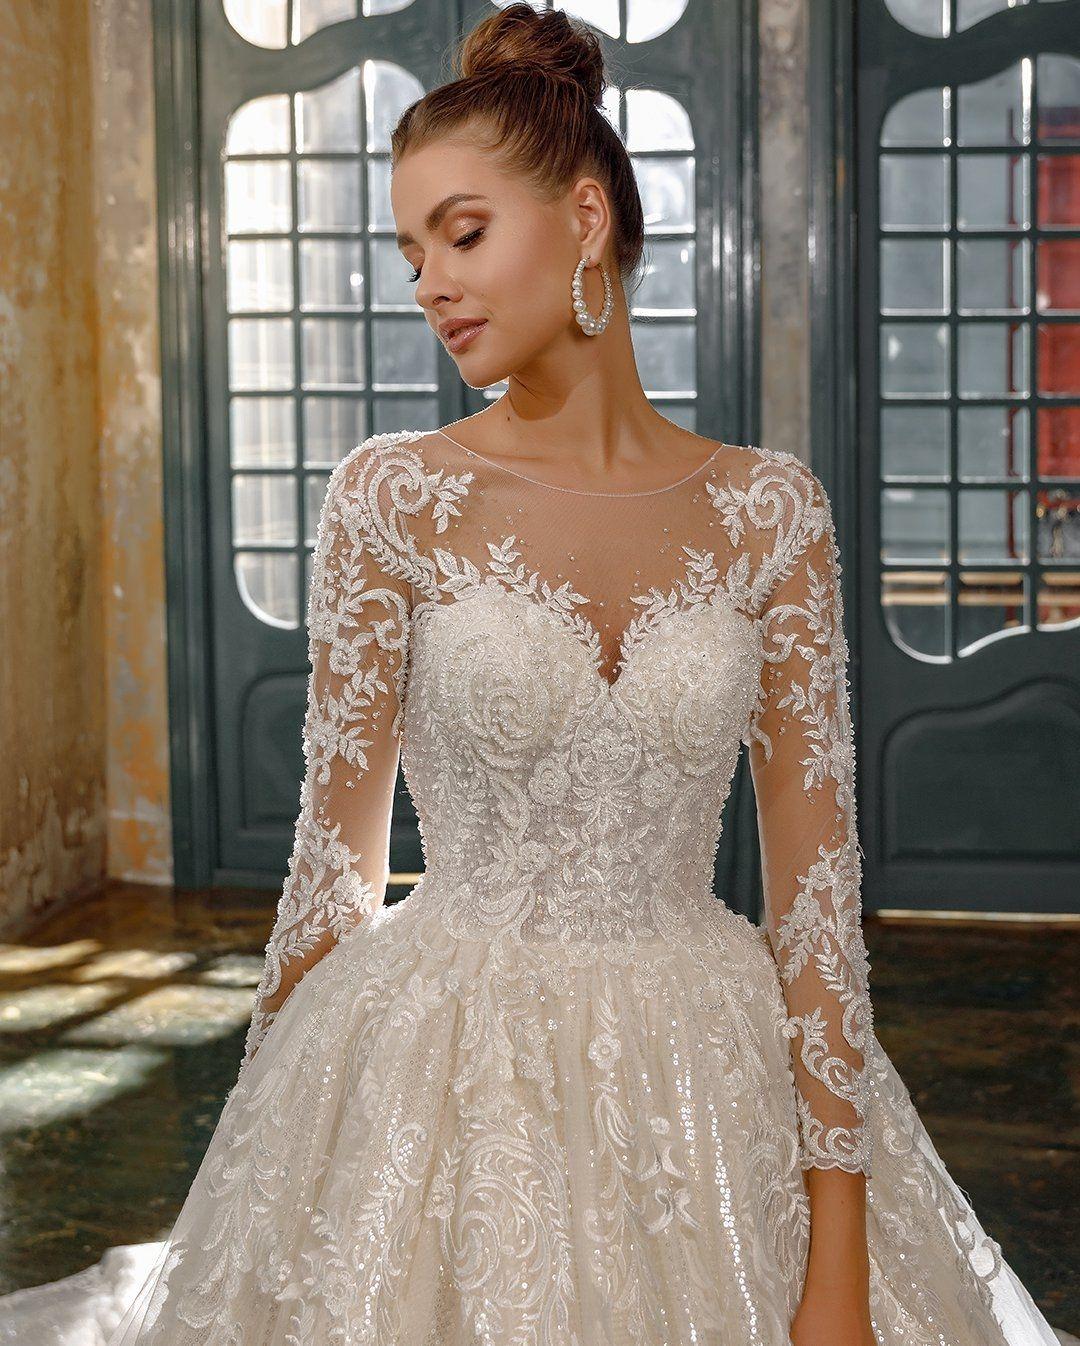 Pin auf Bridal Fashions & Couture